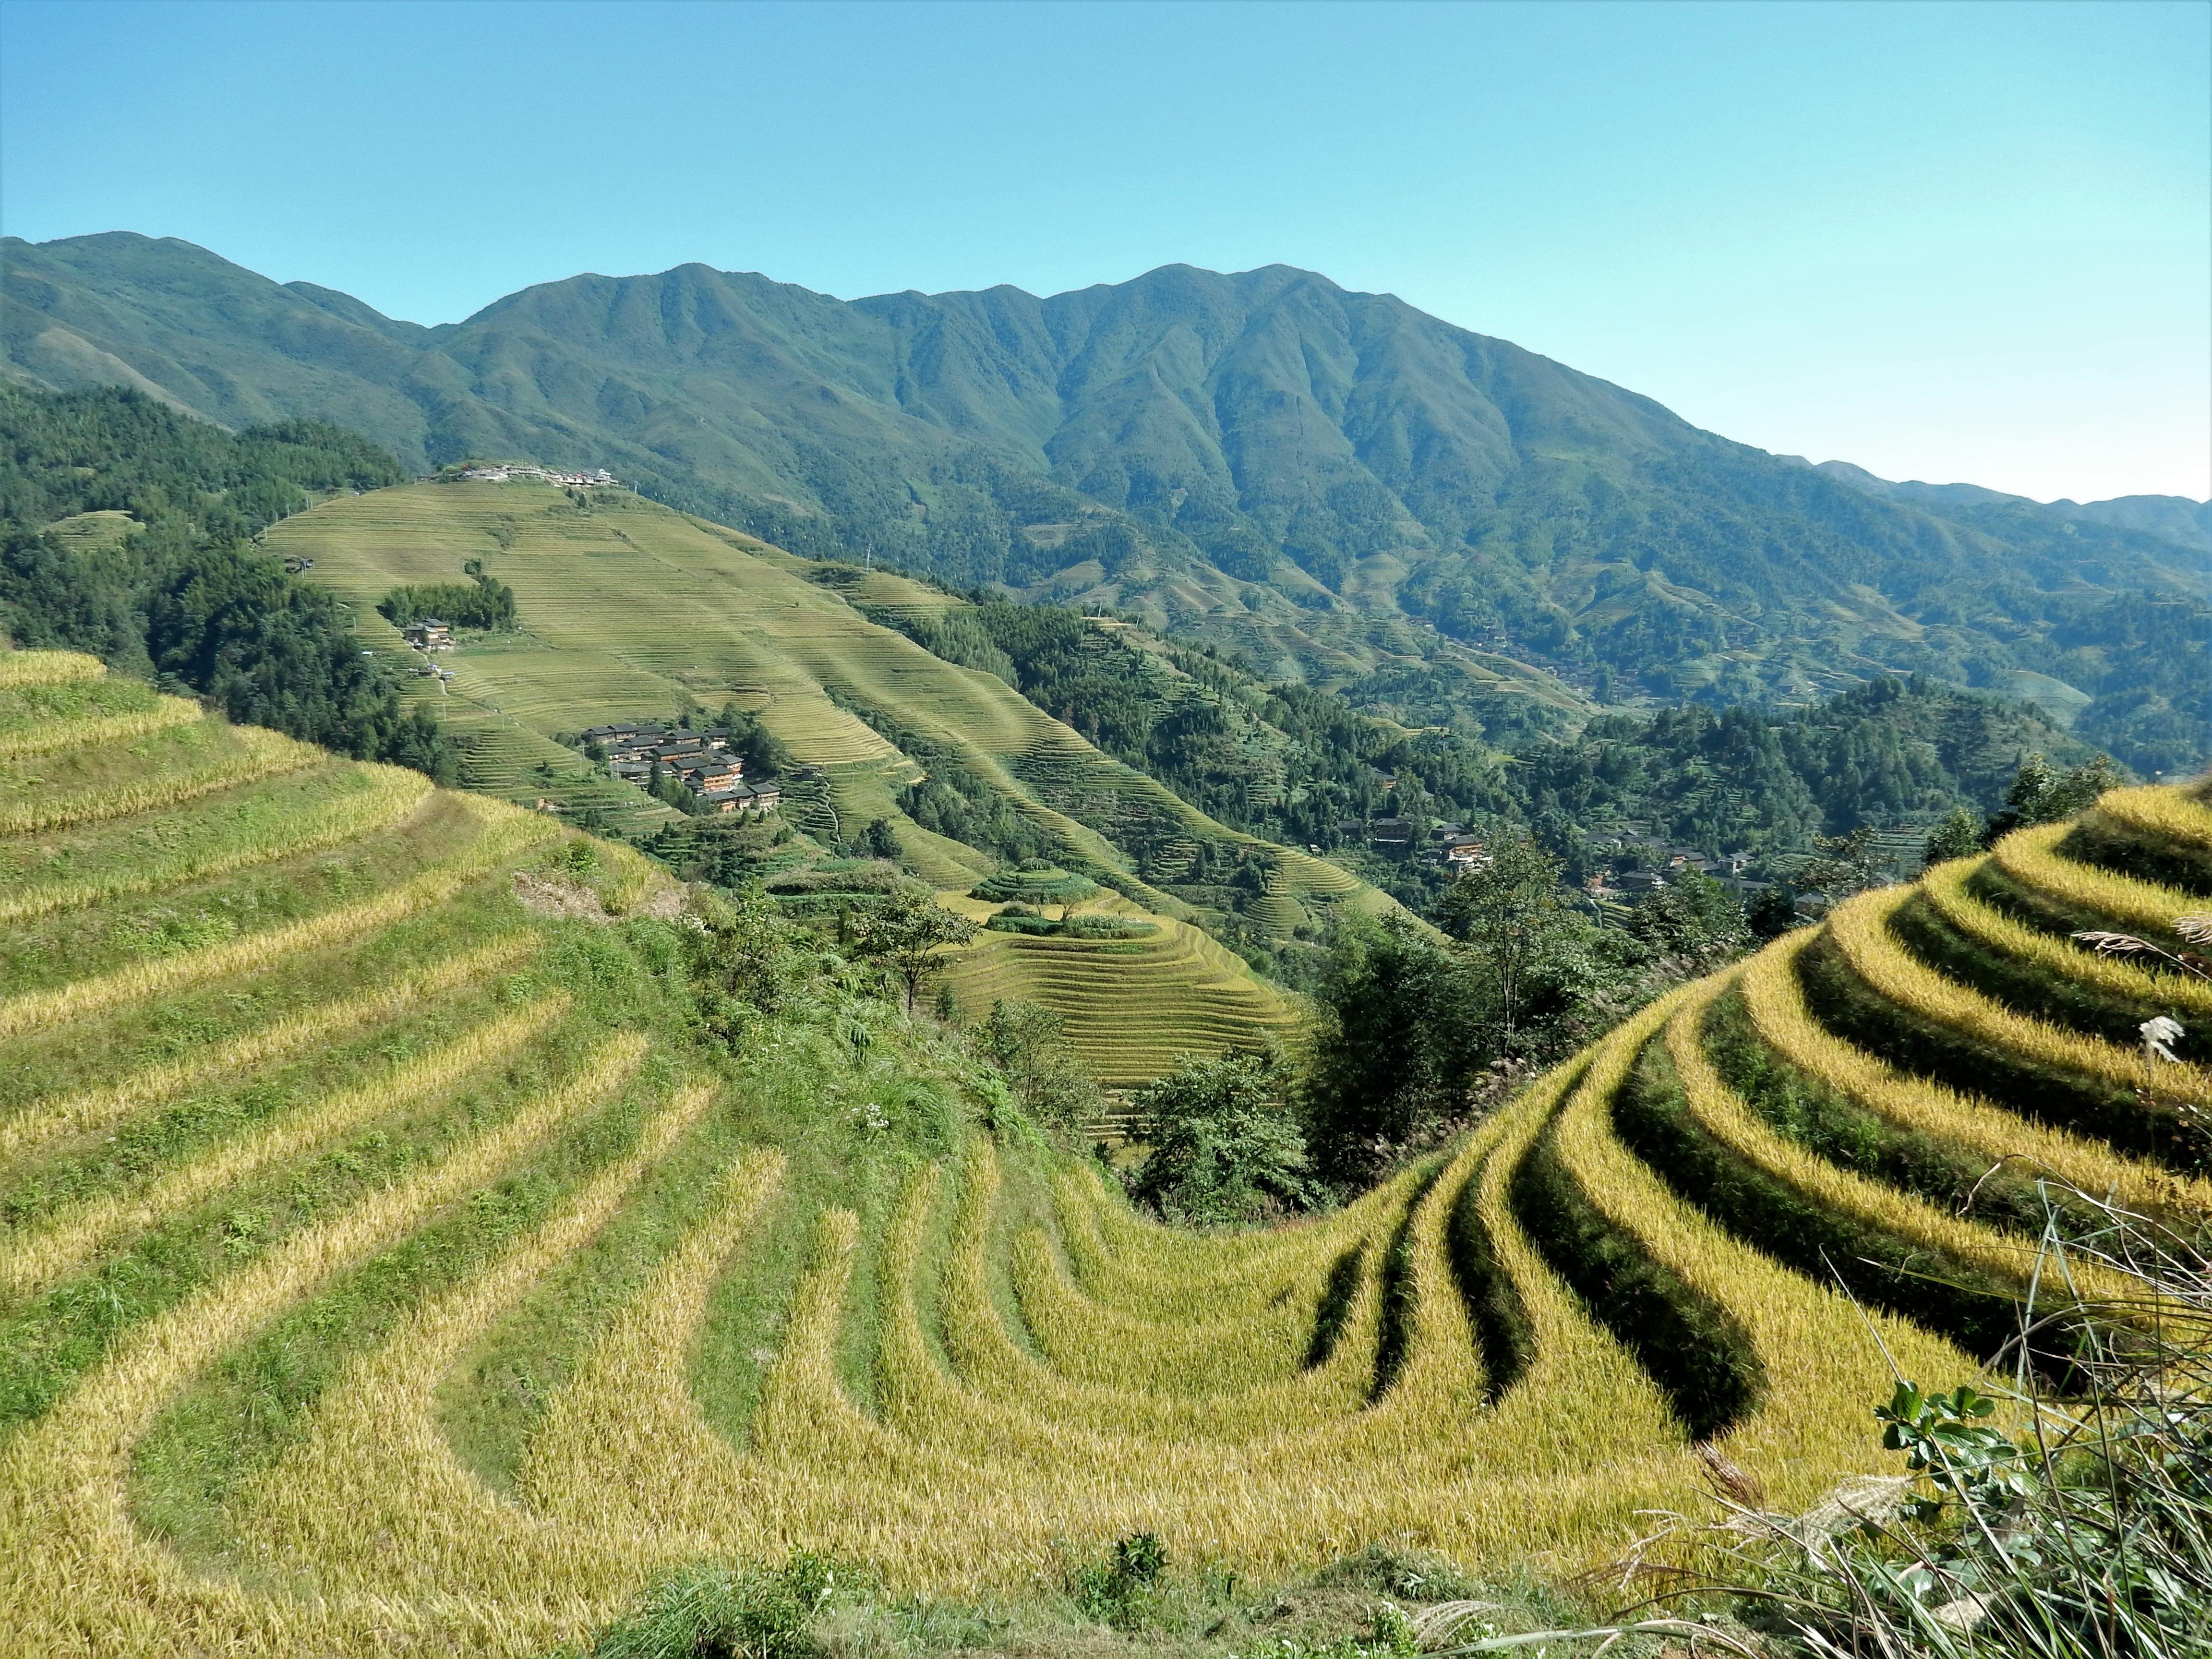 Fotos Gratis Paisaje Naturaleza Montaña Campo Pradera